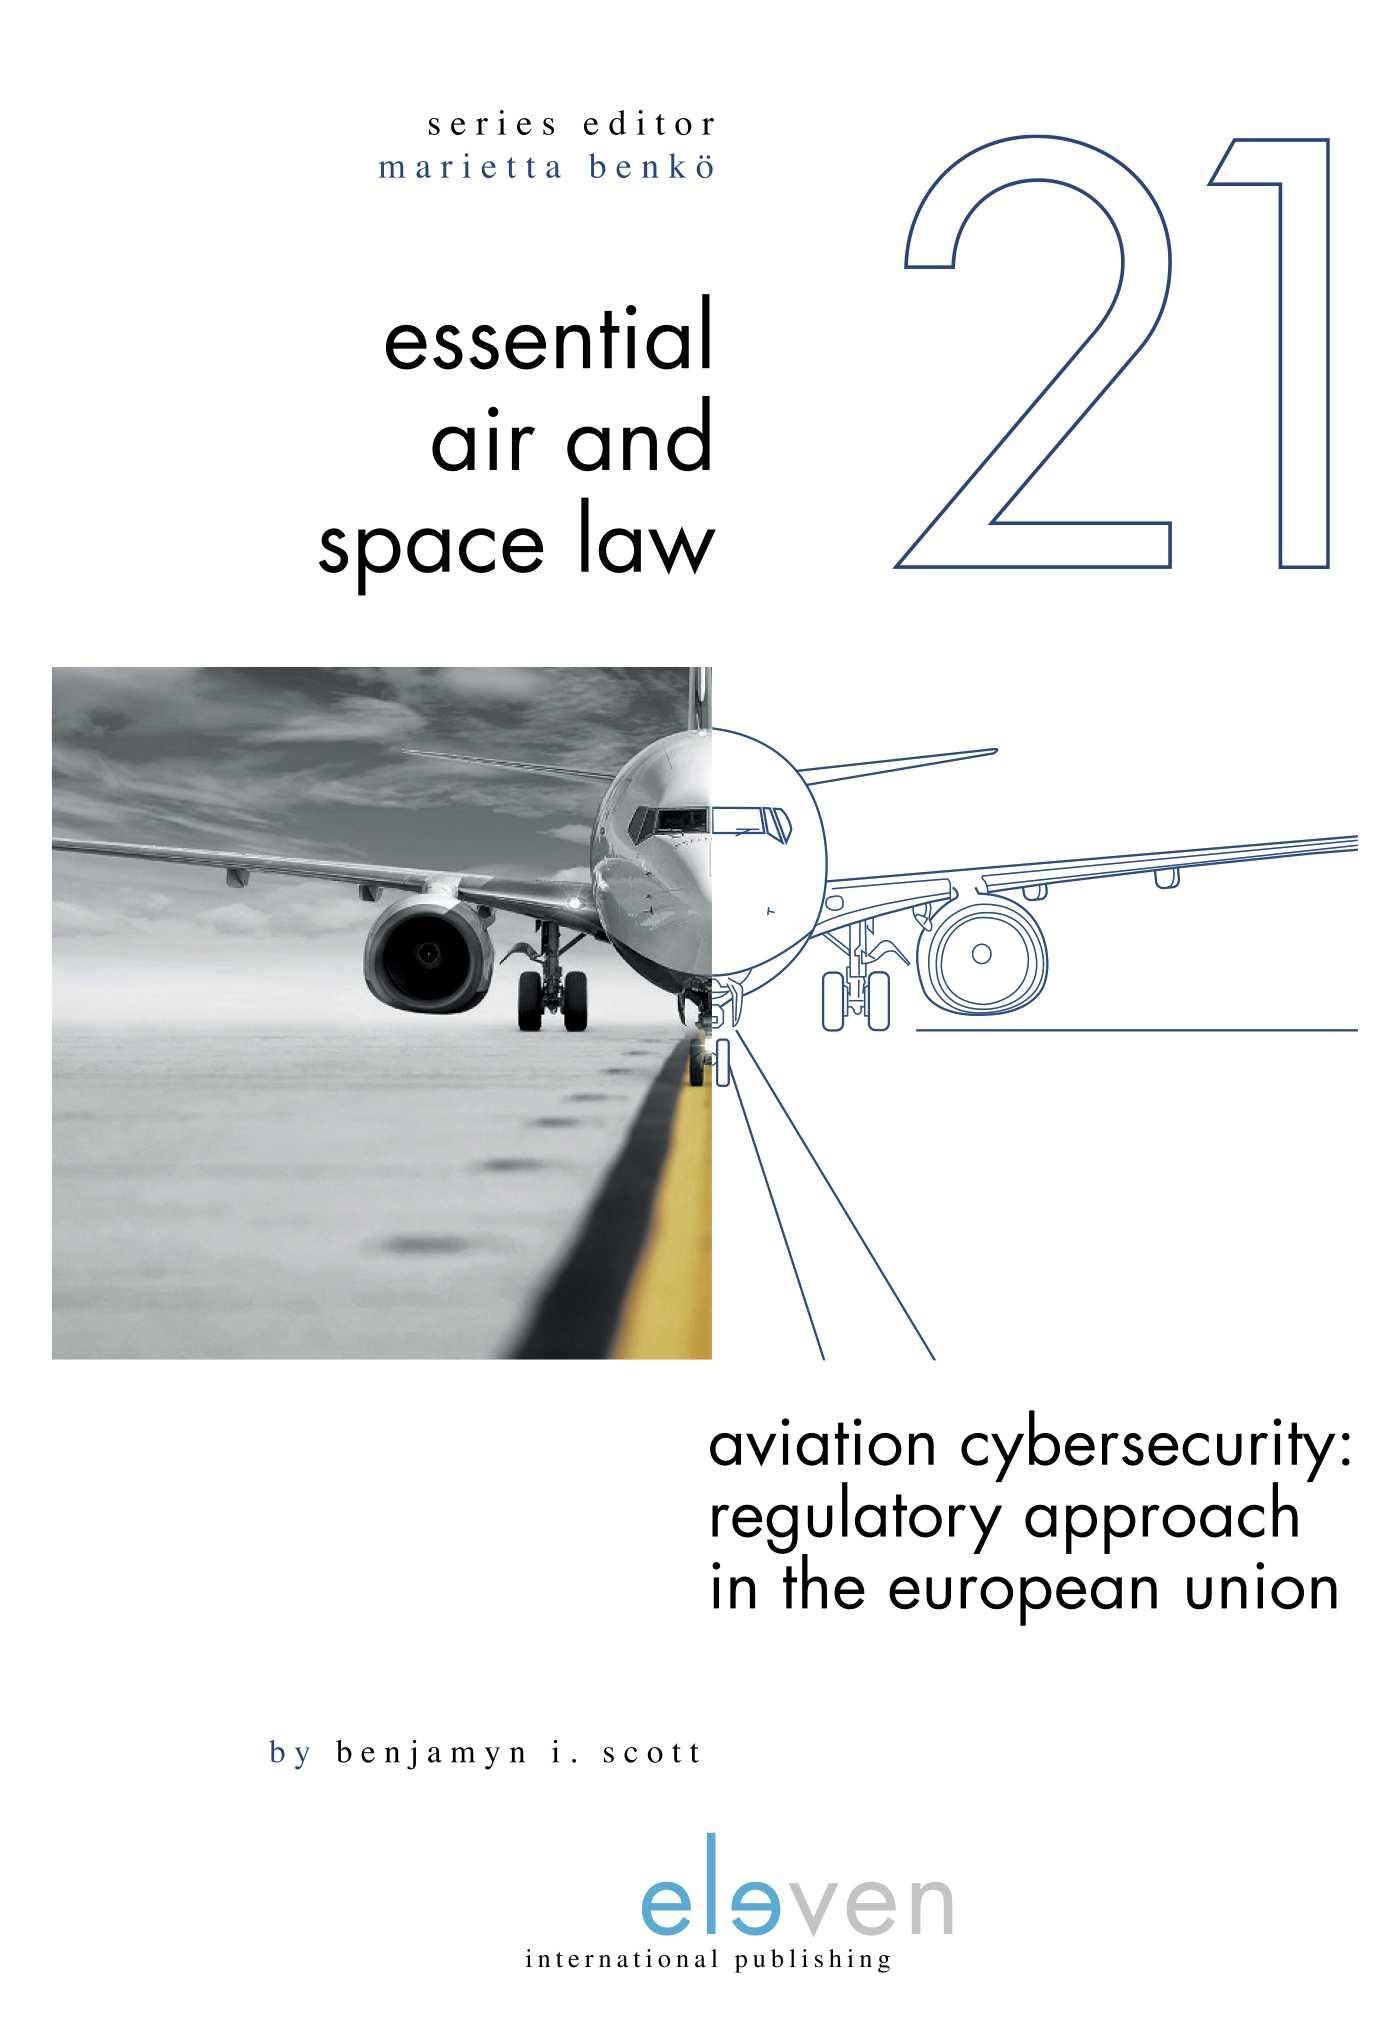 Aviation Cybersecurity: Regulatory Approach in the European Union